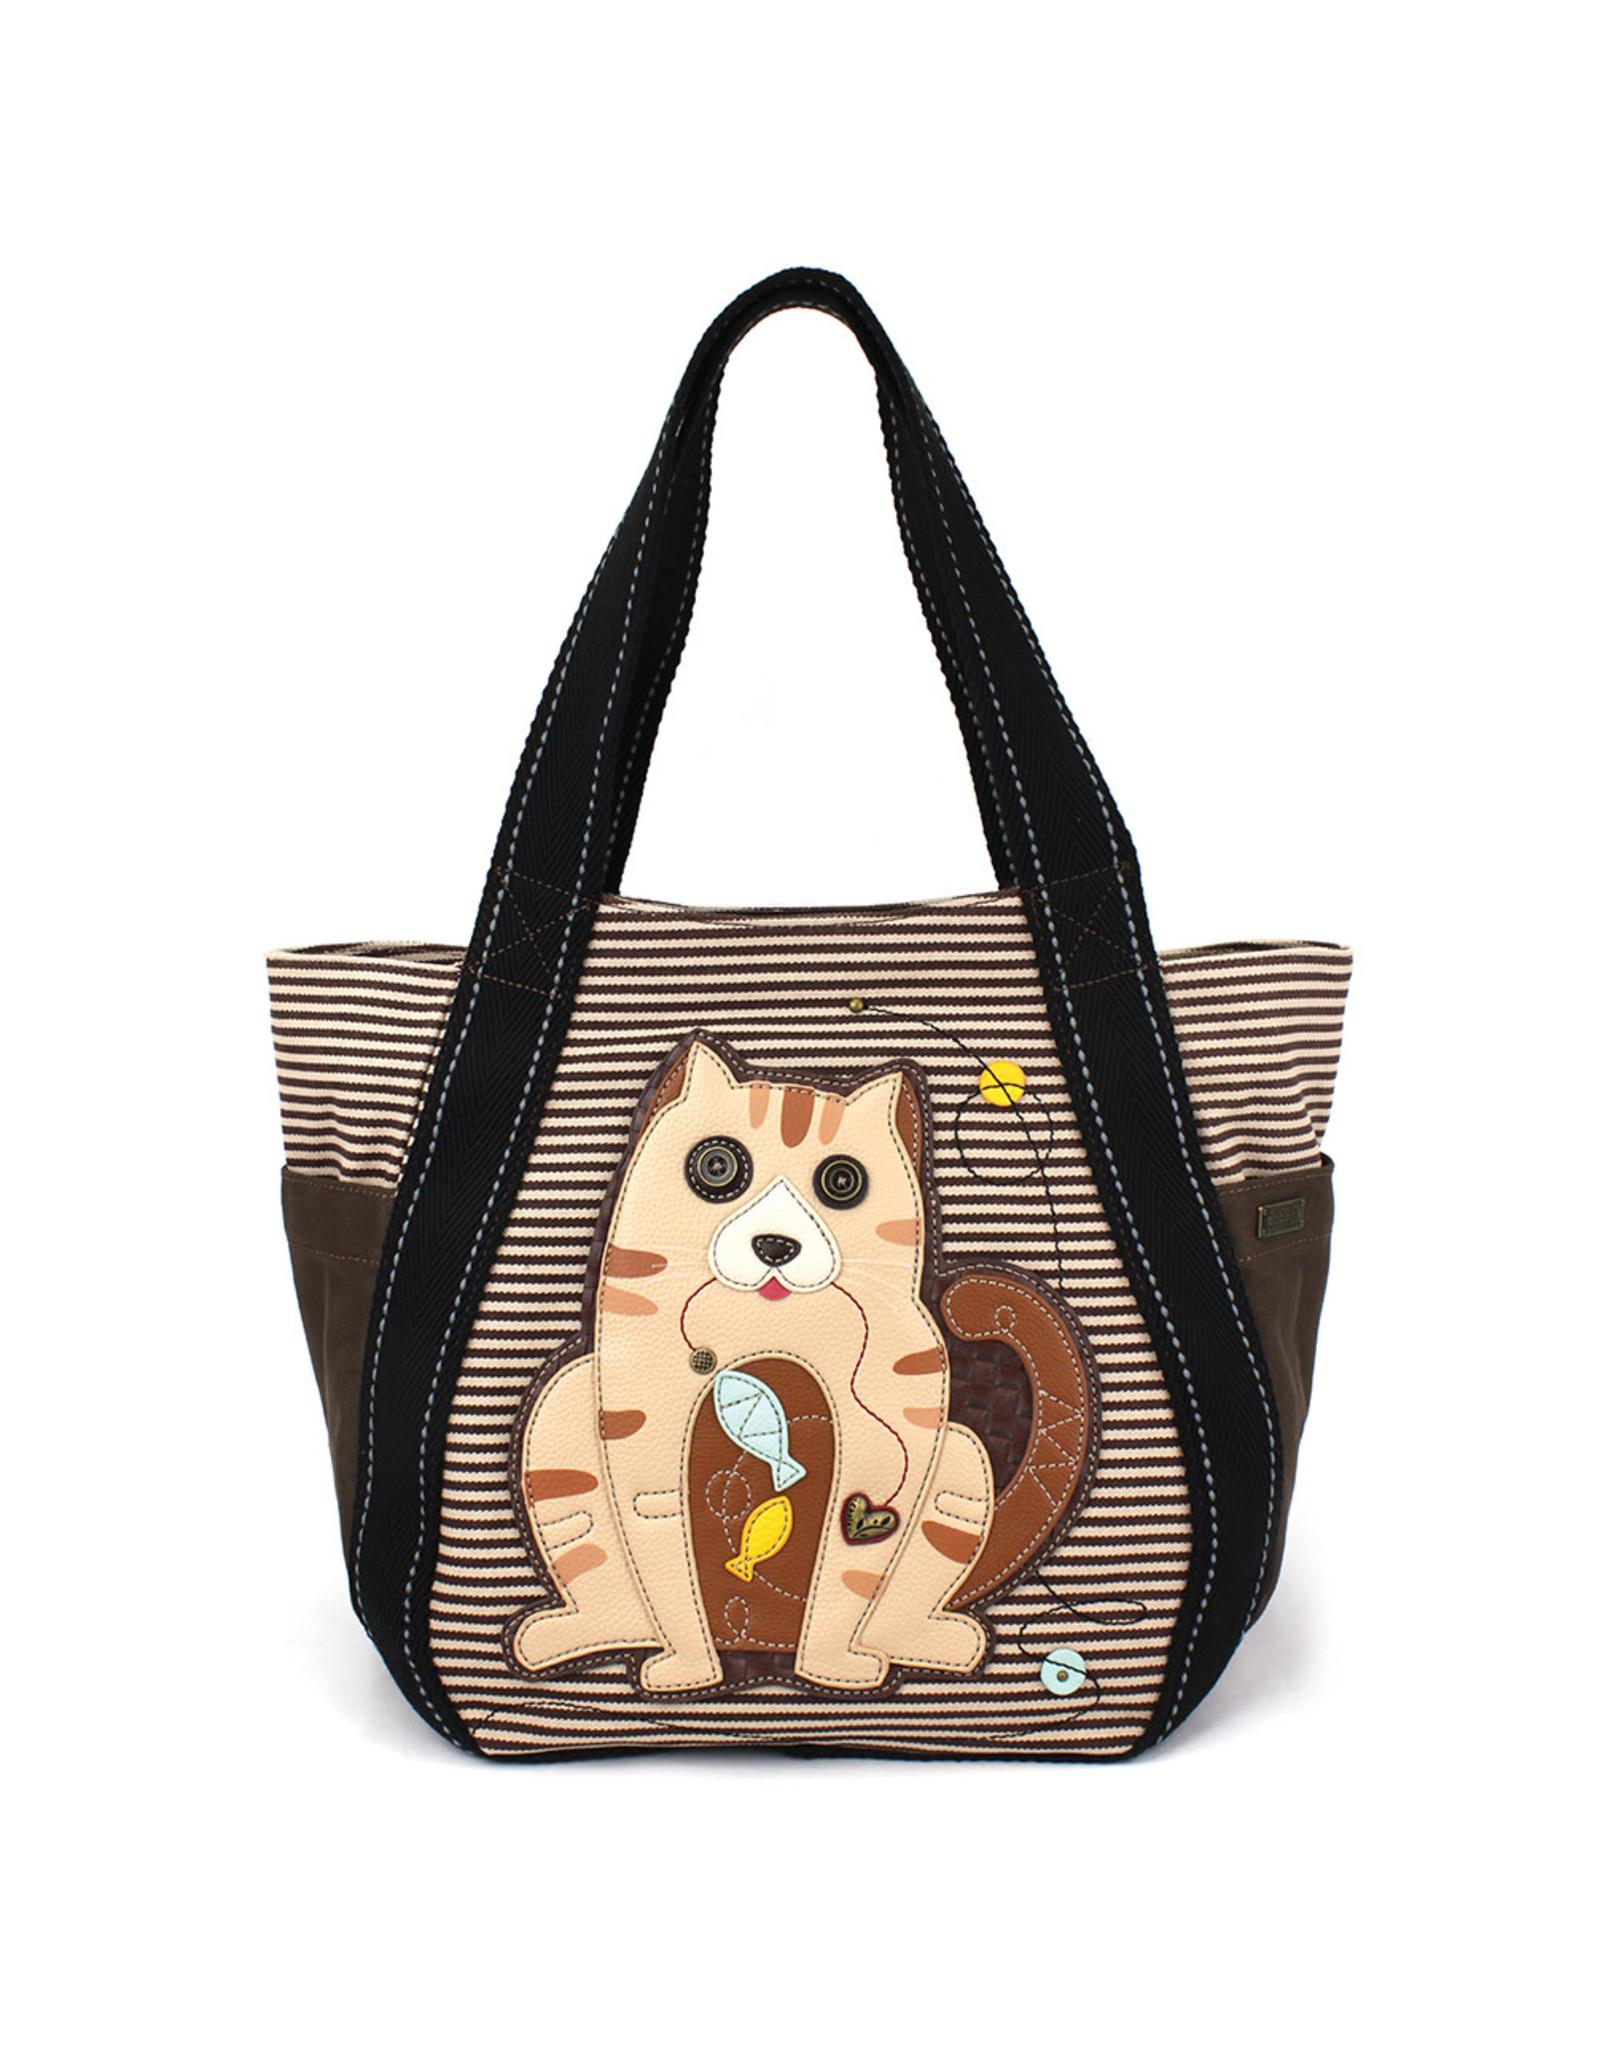 Chala Carryall Zip Tote - Cat Gen II